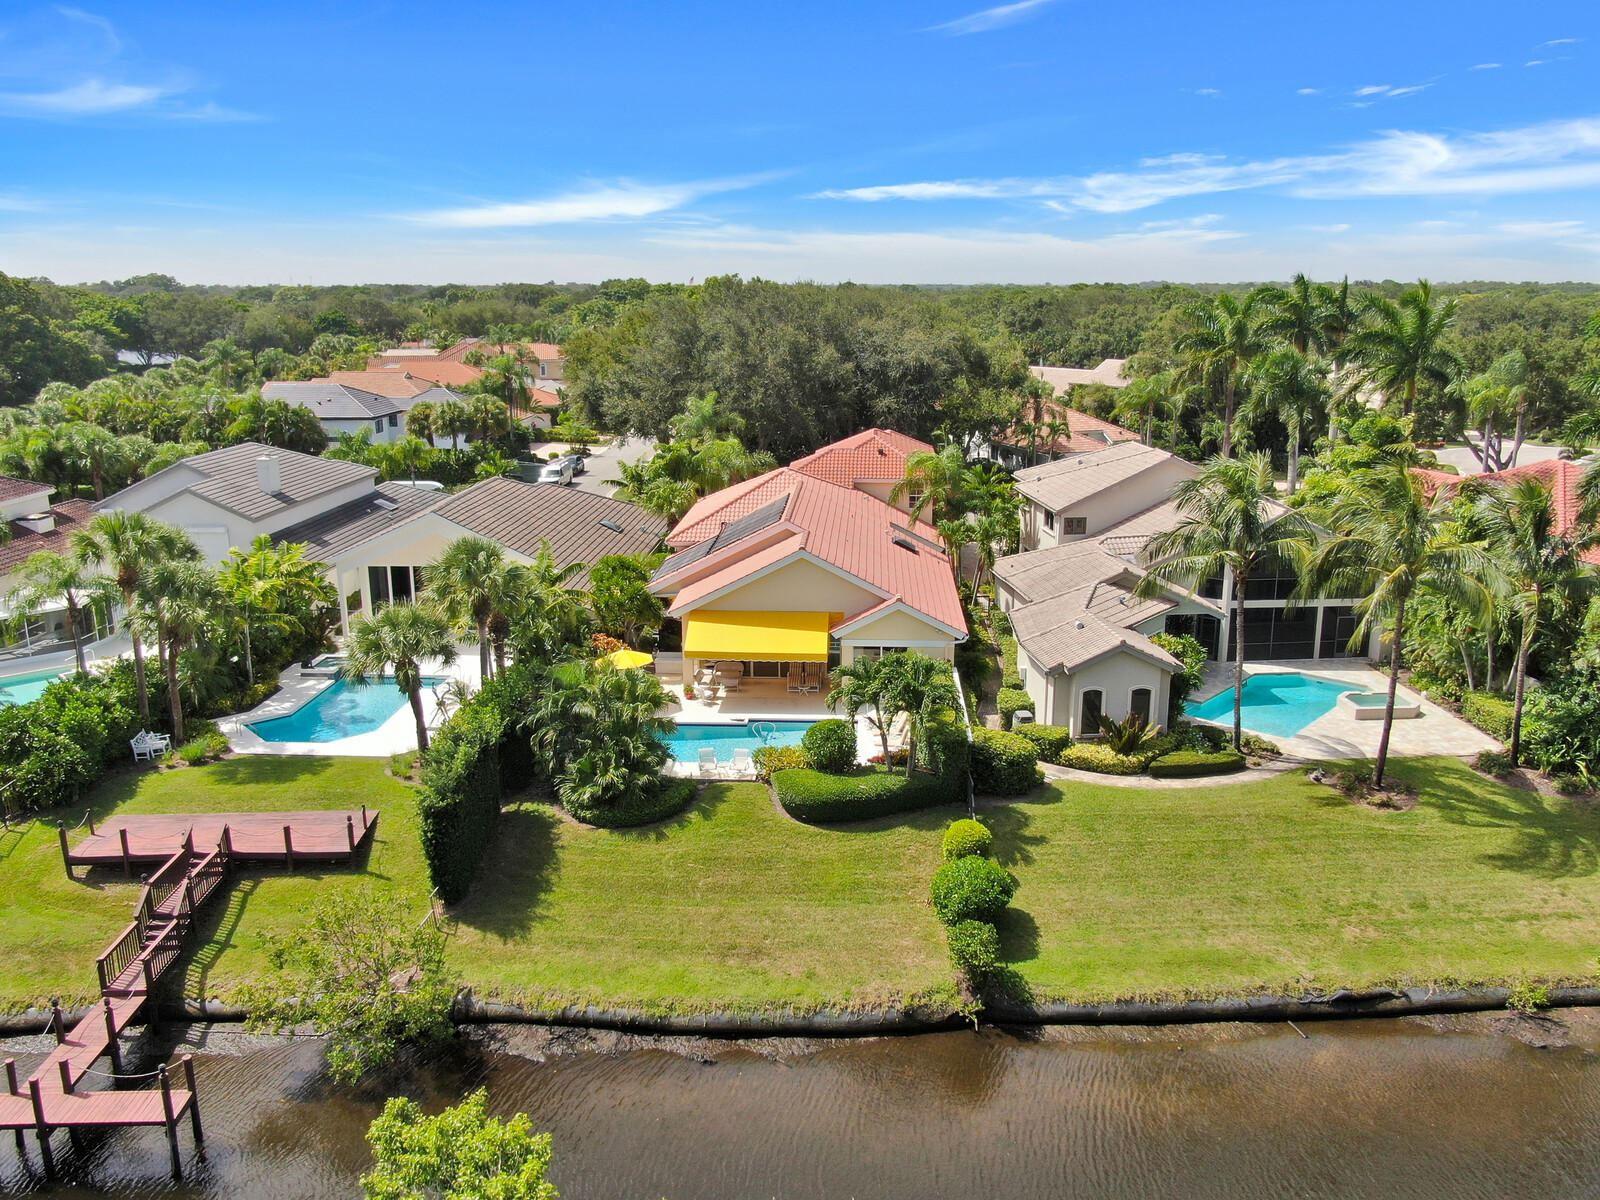 Photo of 3266 Degas Drive E, Palm Beach Gardens, FL 33410 (MLS # RX-10653699)